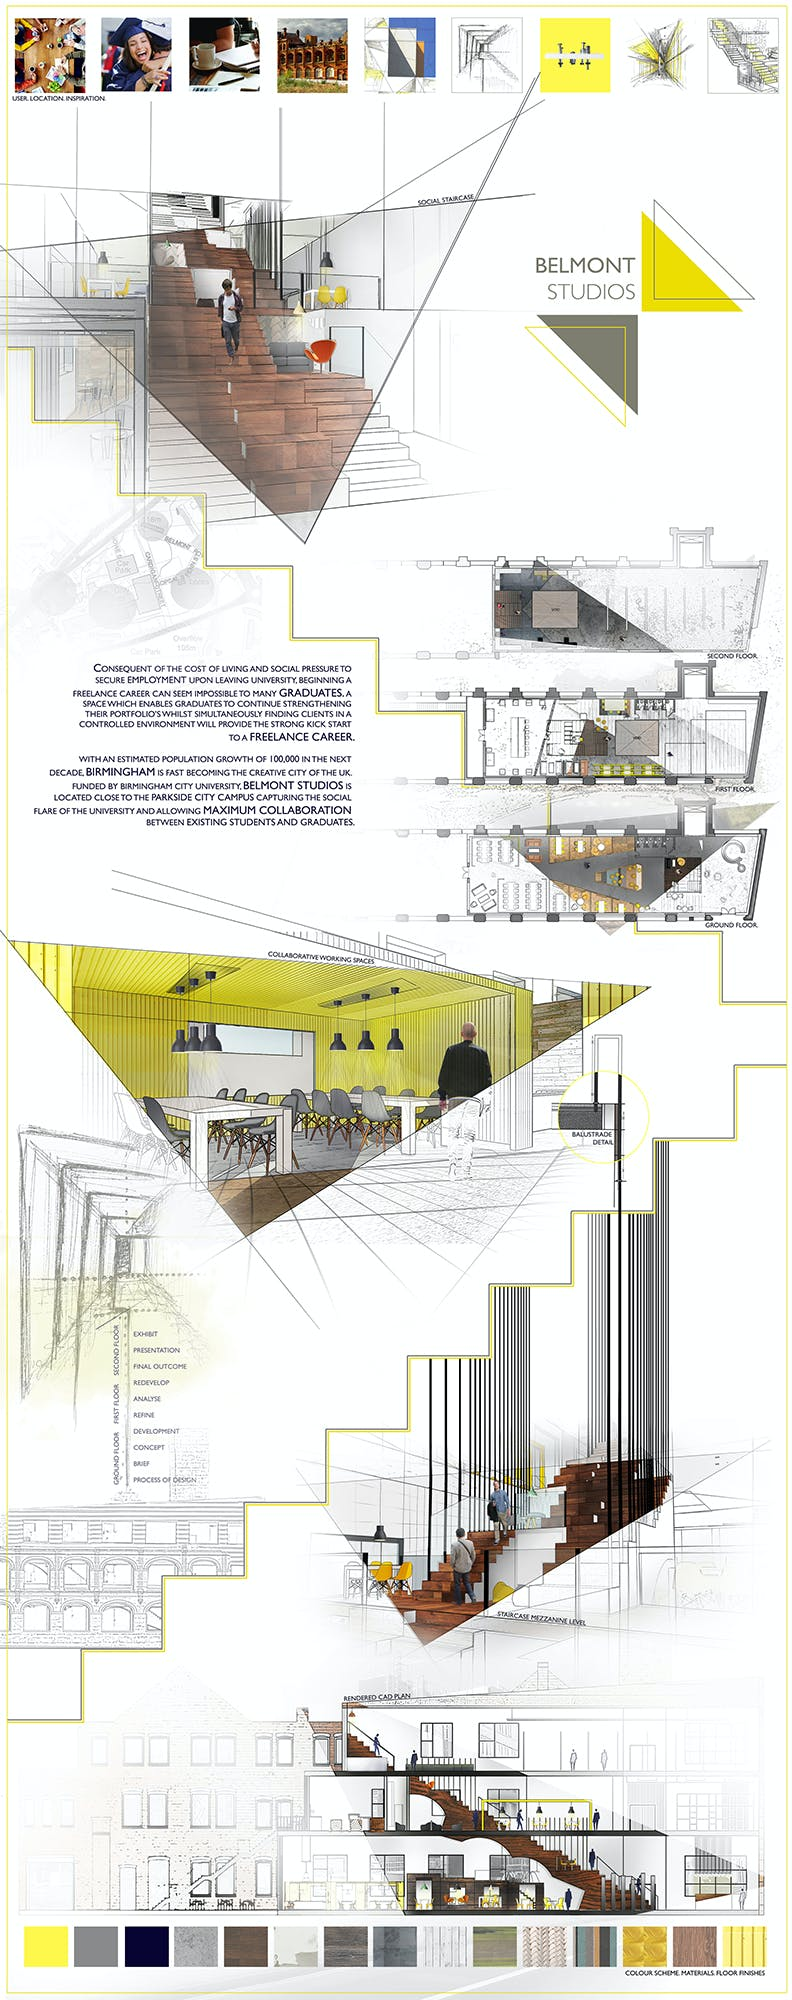 Sydney Davies interior architecture and design student work